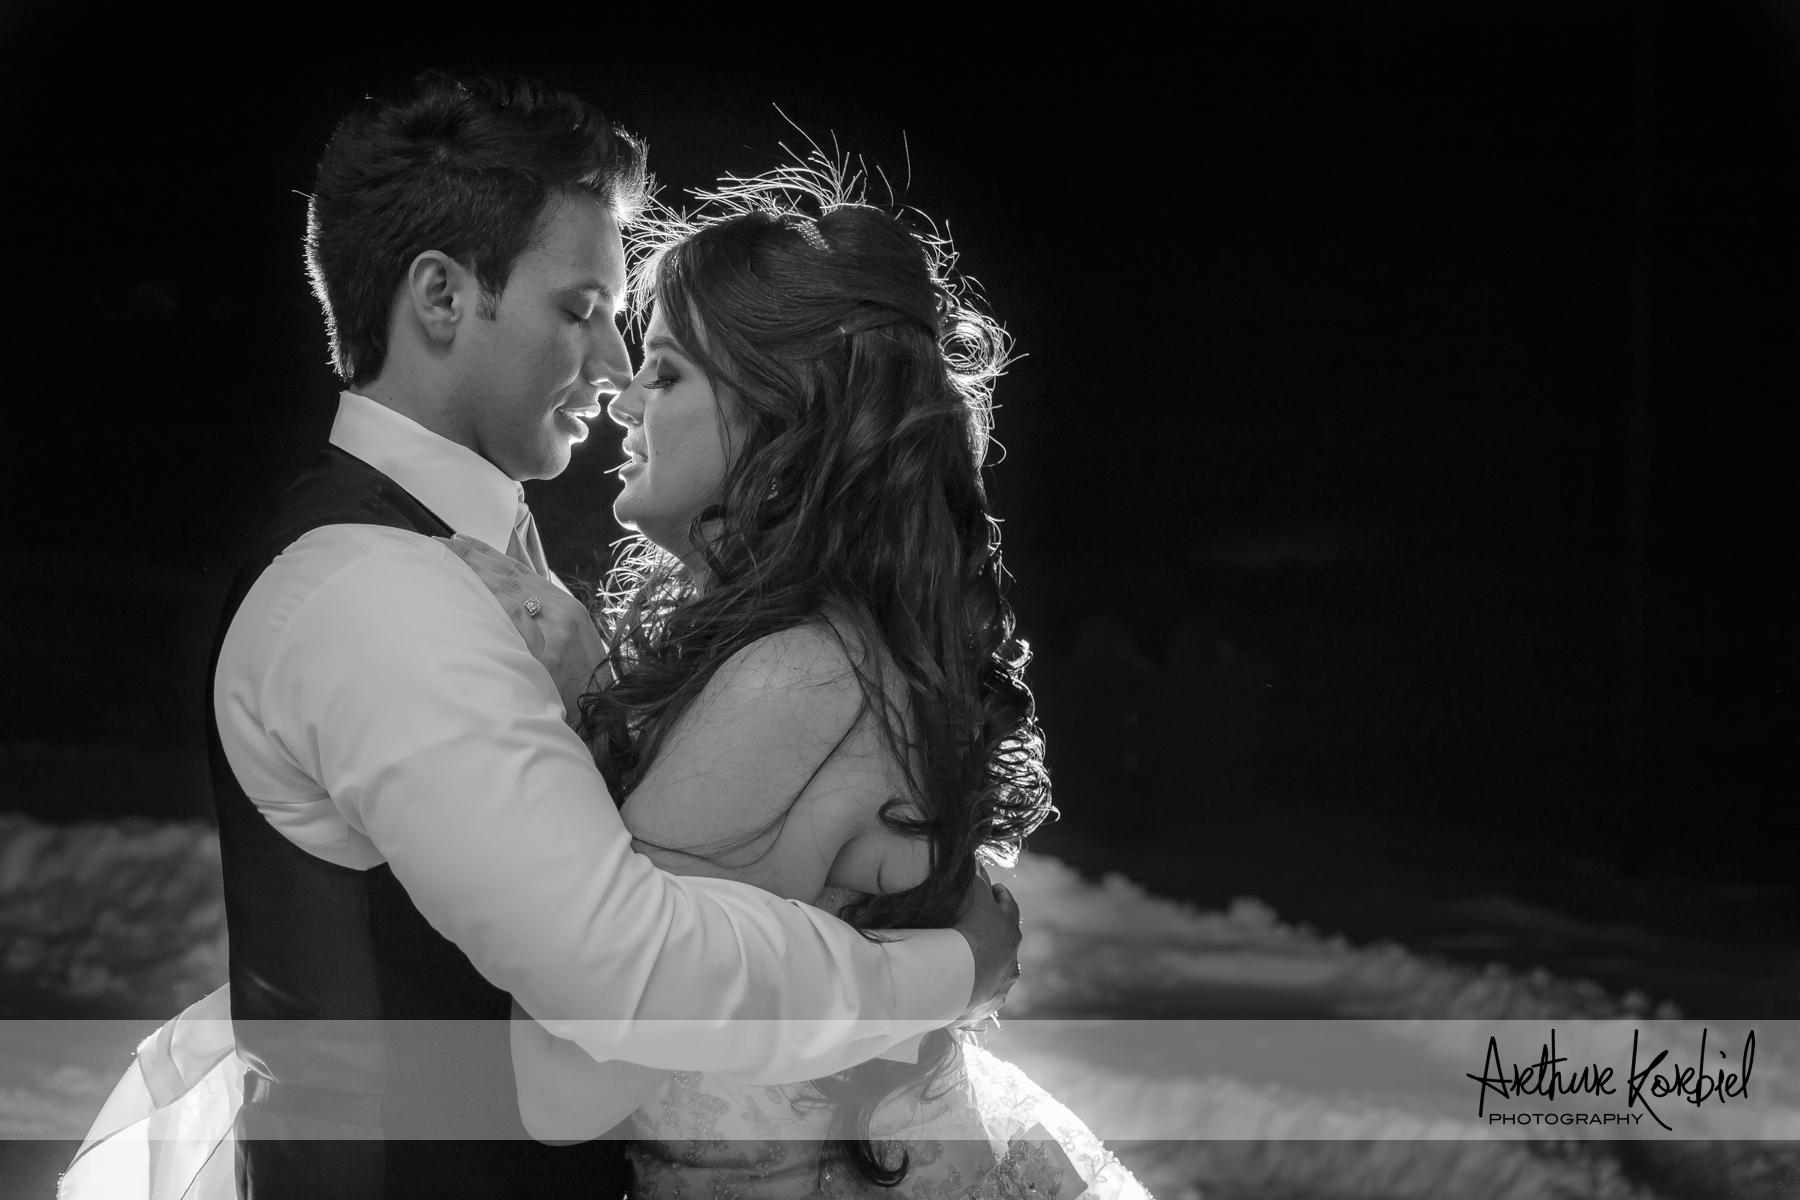 Arthur Korbiel Photography - London Wedding Photographer - Maria & Jose-016.jpg